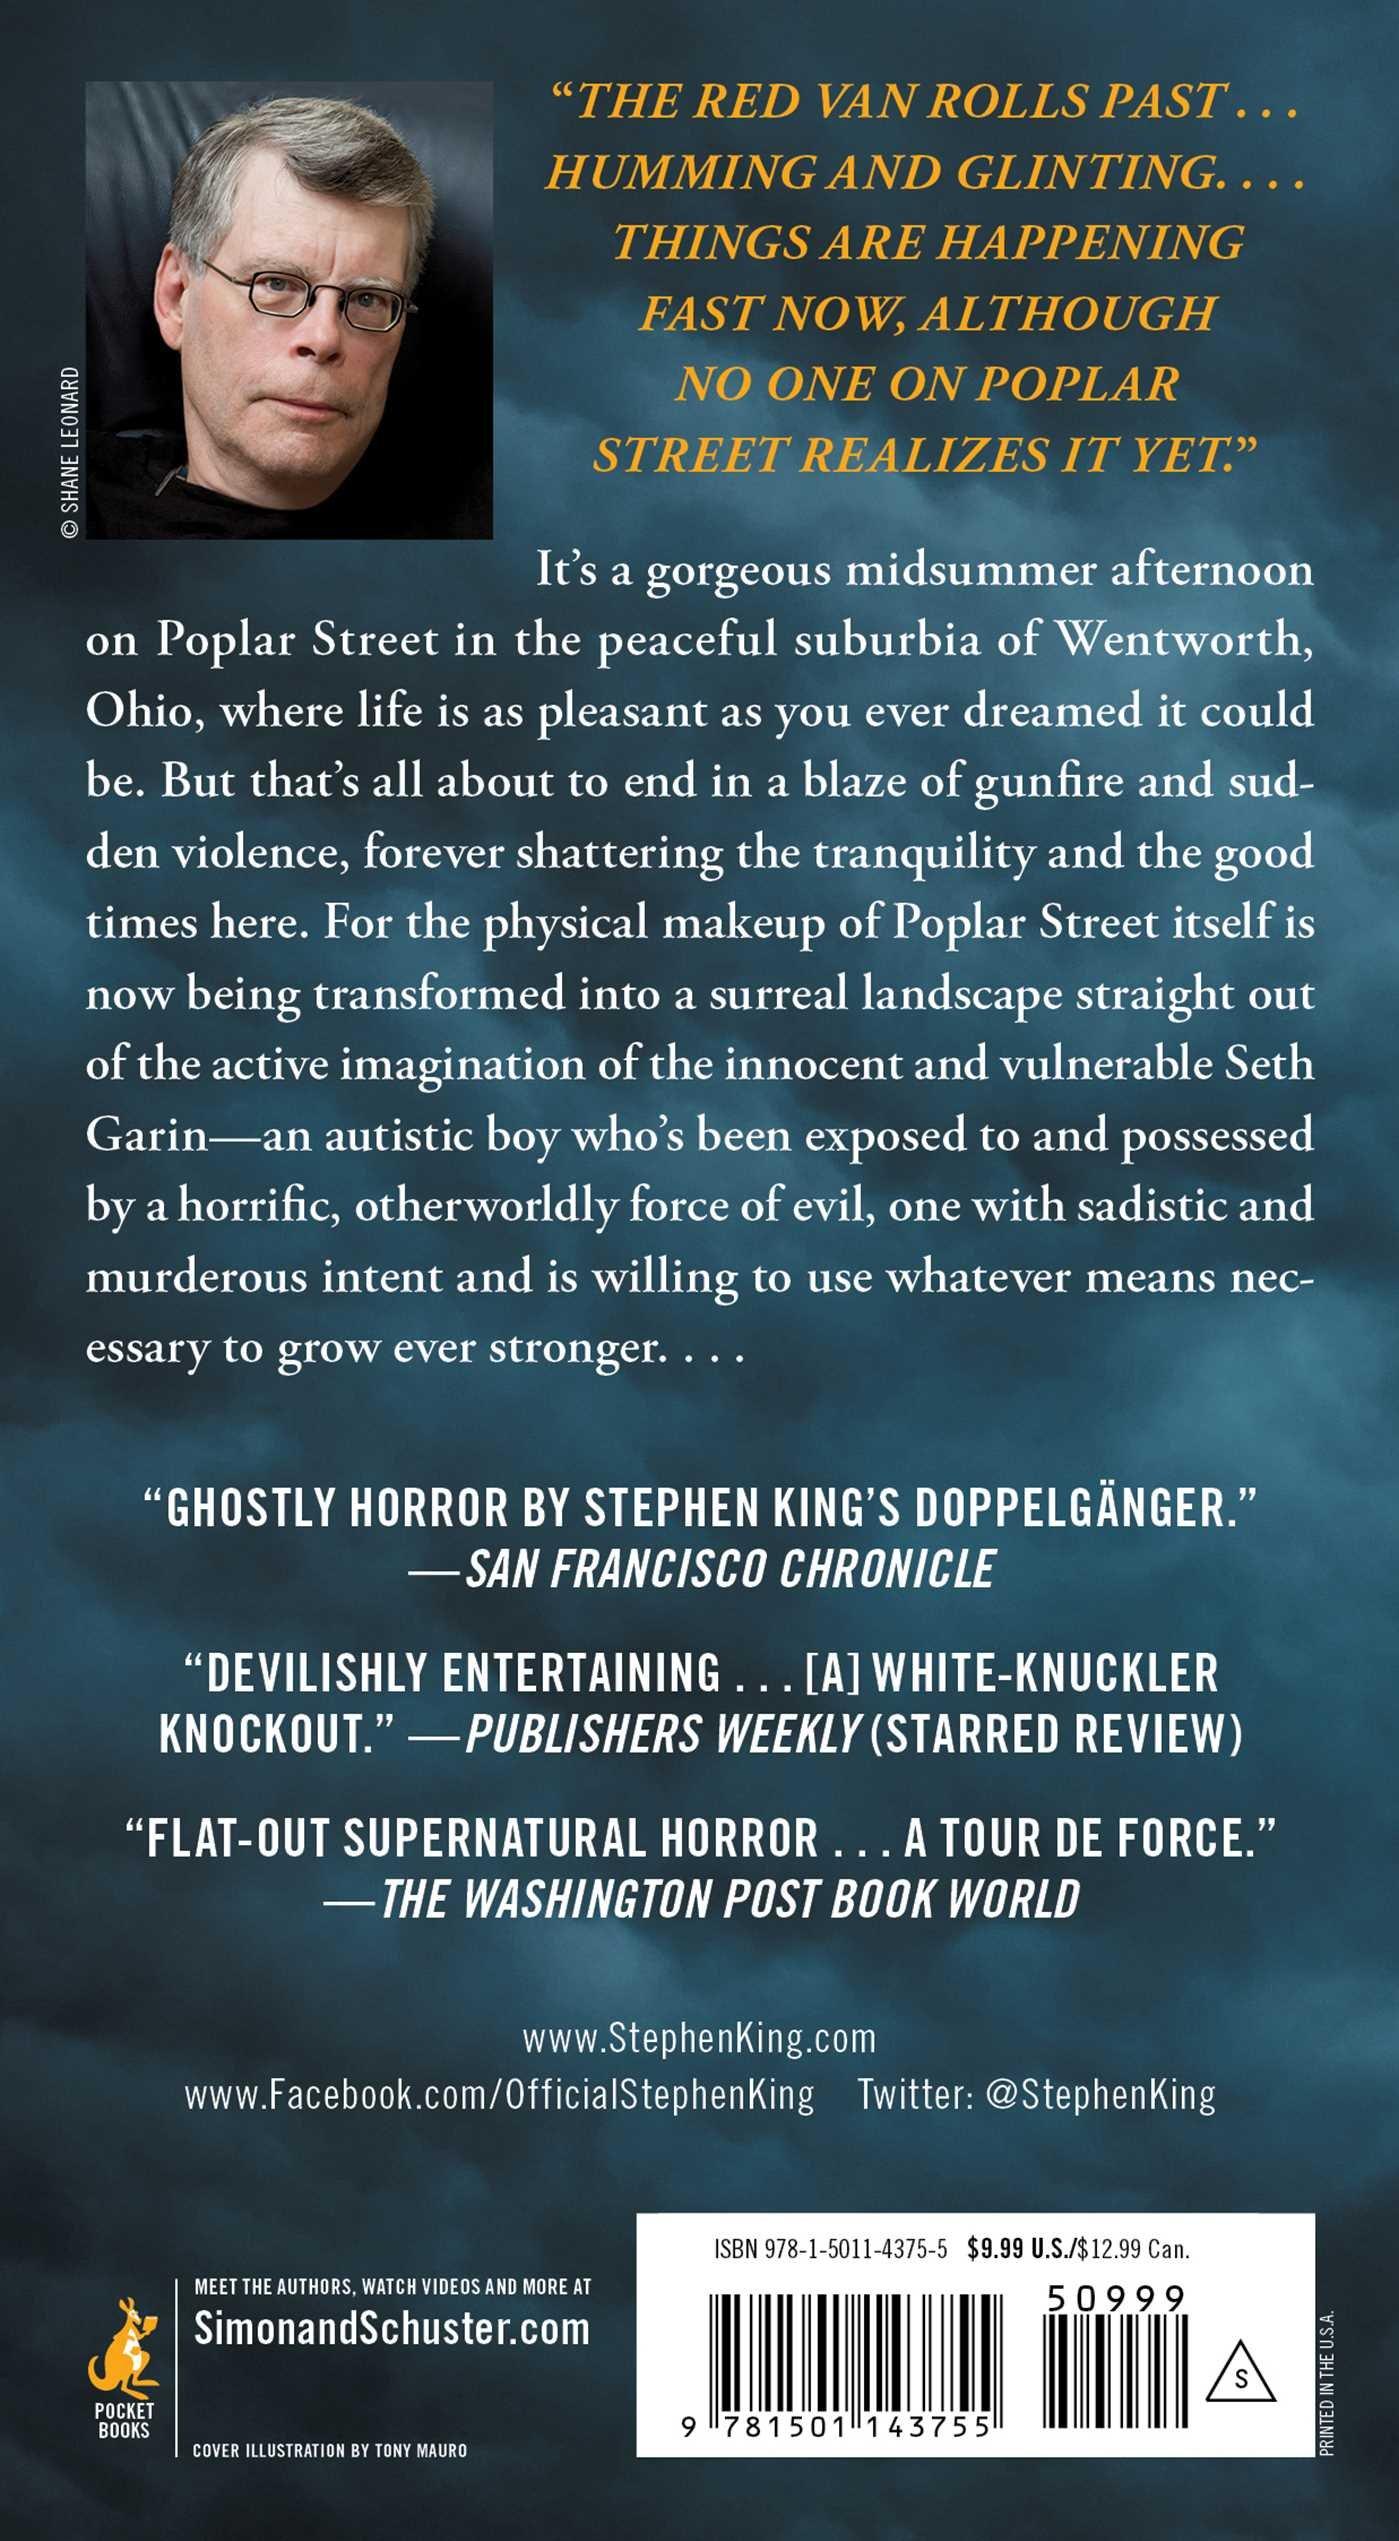 Amazon: The Regulators: A Novel (9781501143755): Stephen King: Books